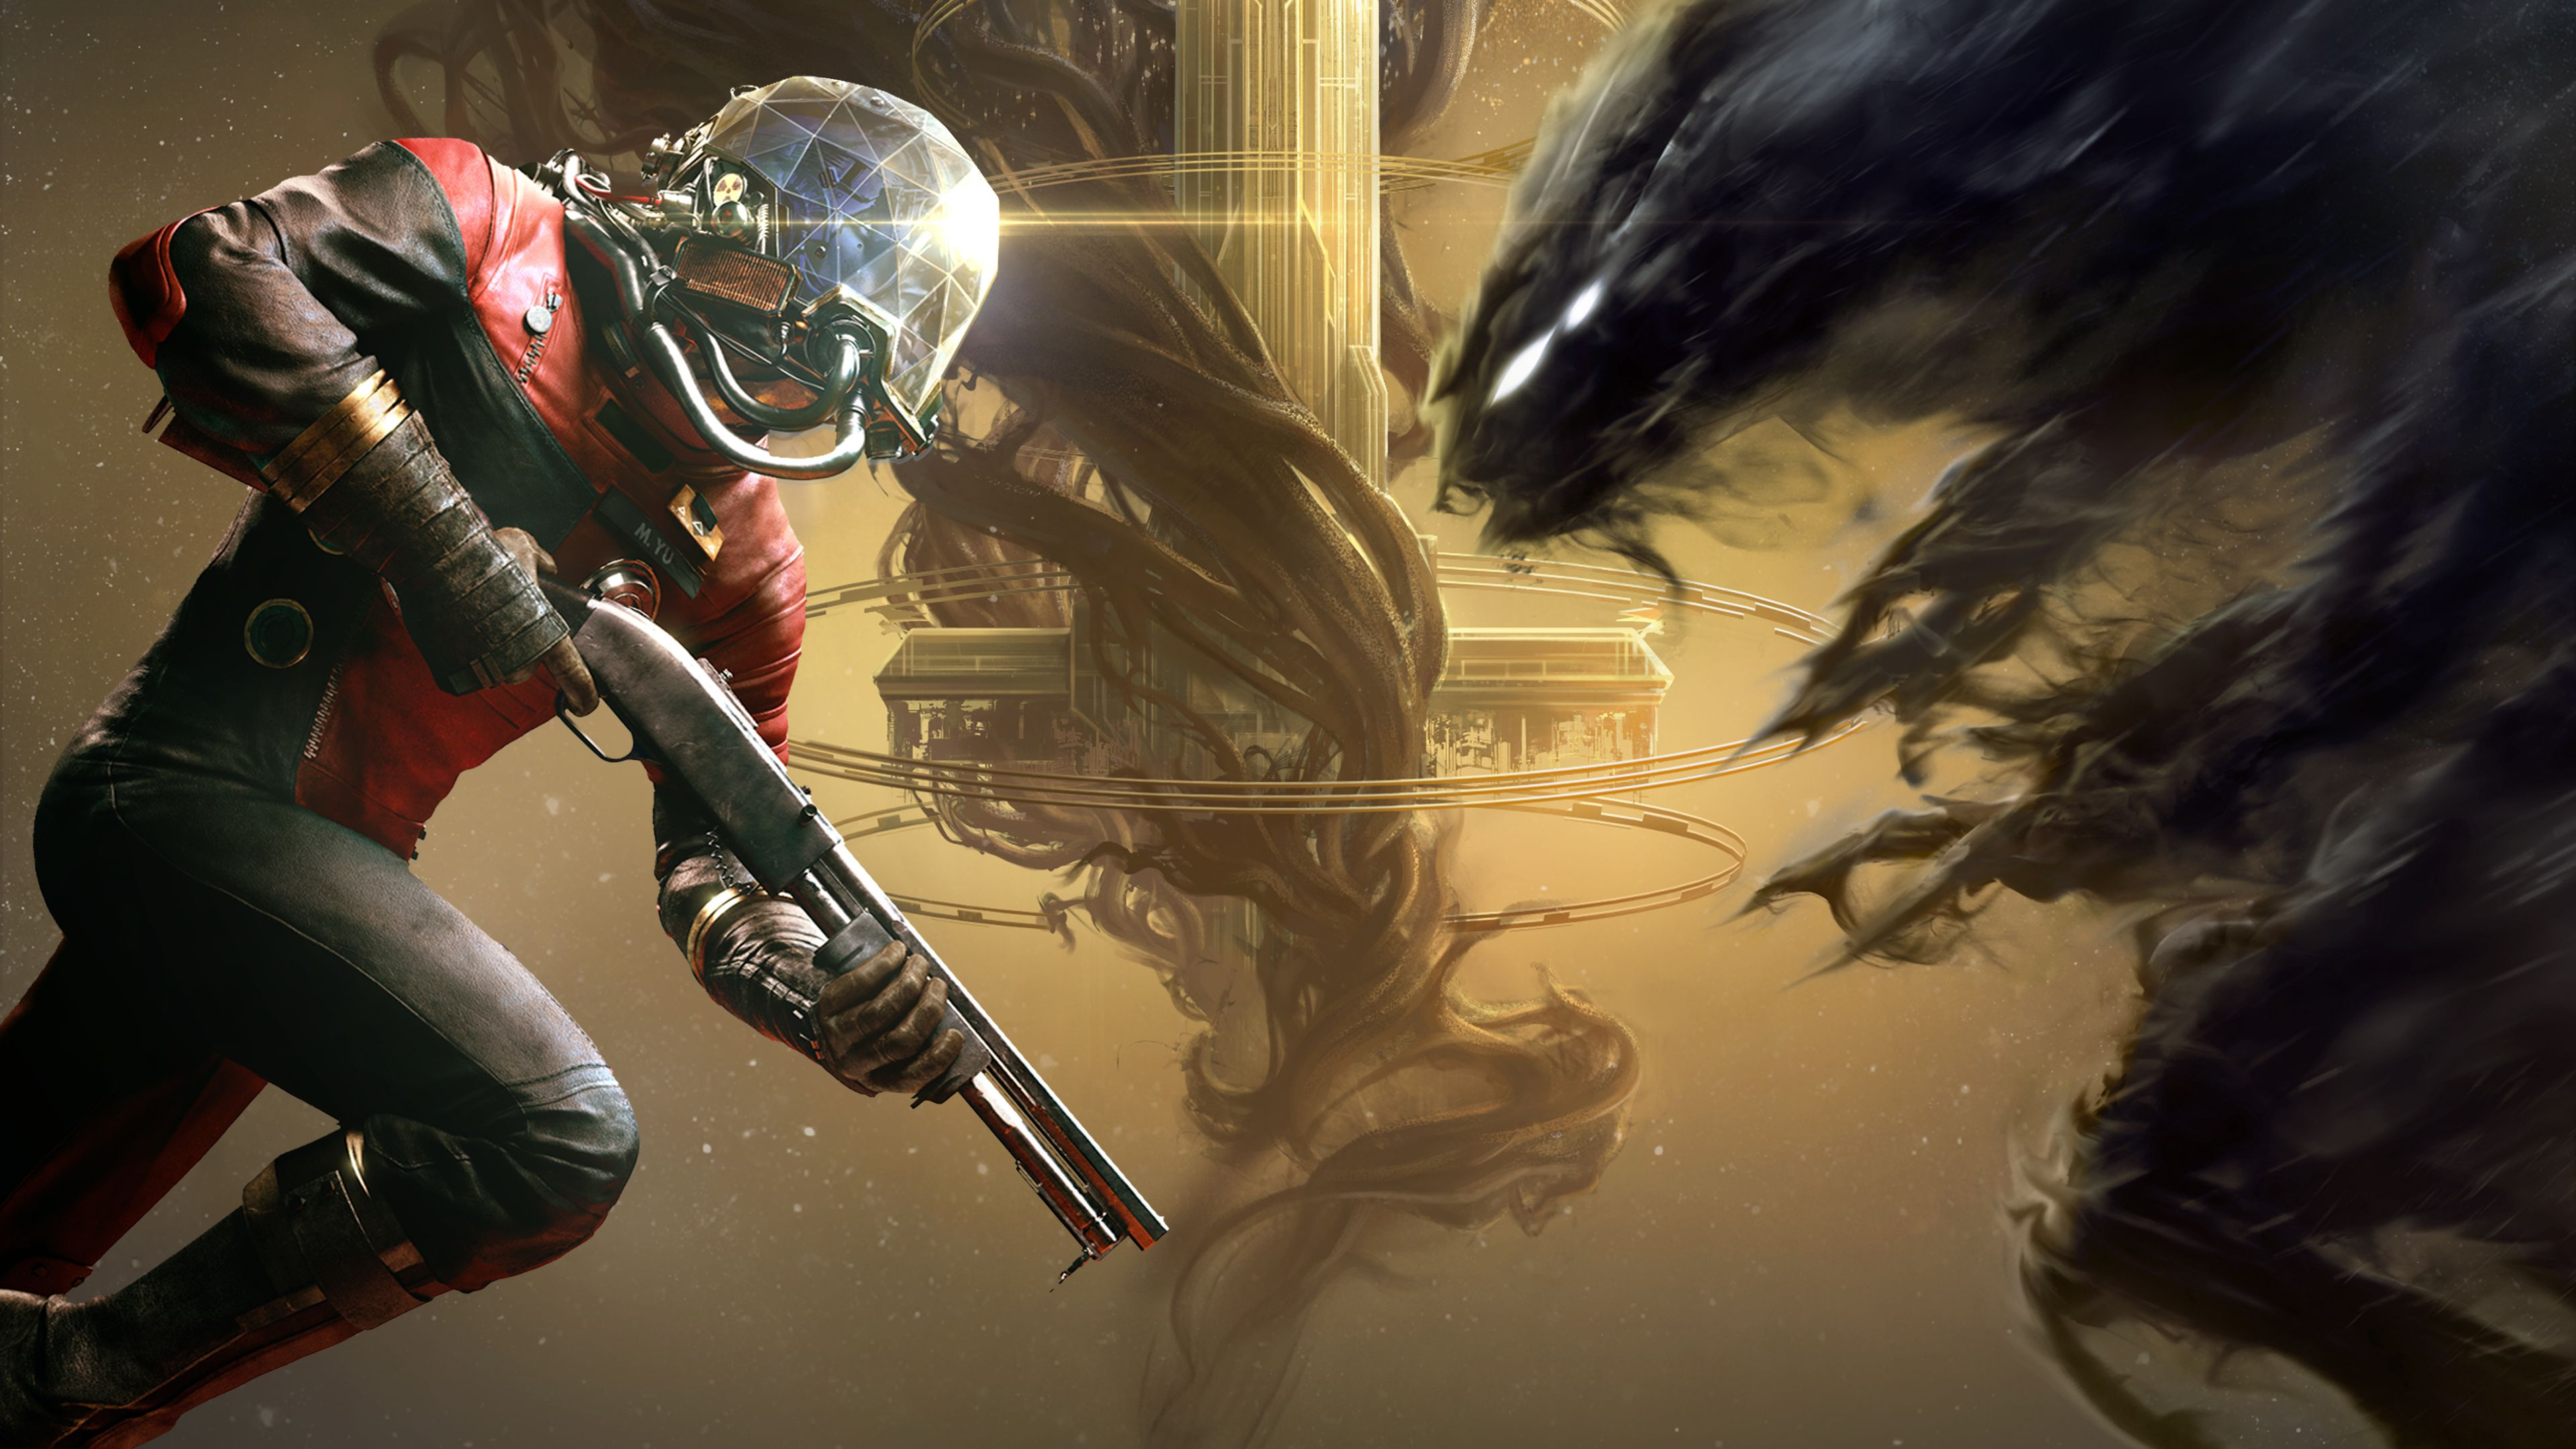 10 Latest Ps4 Games Wallpaper Hd Full Hd 1080p For Pc Background Kratos God Of War God Of War Concept Art World